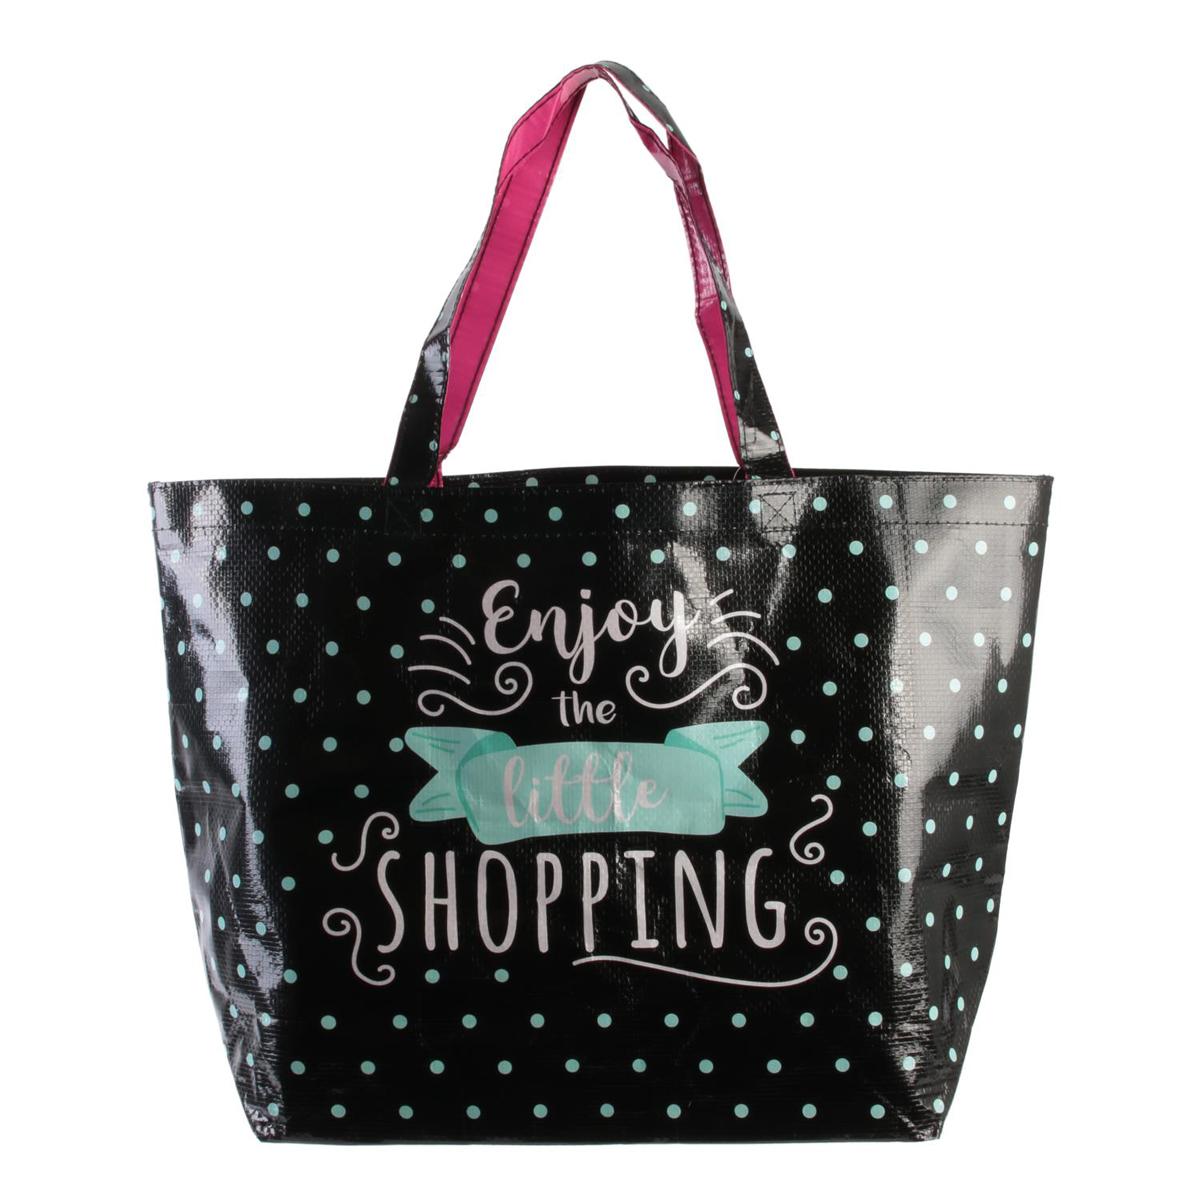 Sac Shopping \'Enjoy the little Shopping\' noir turquoise - 50x35x15 cm - [Q8101]